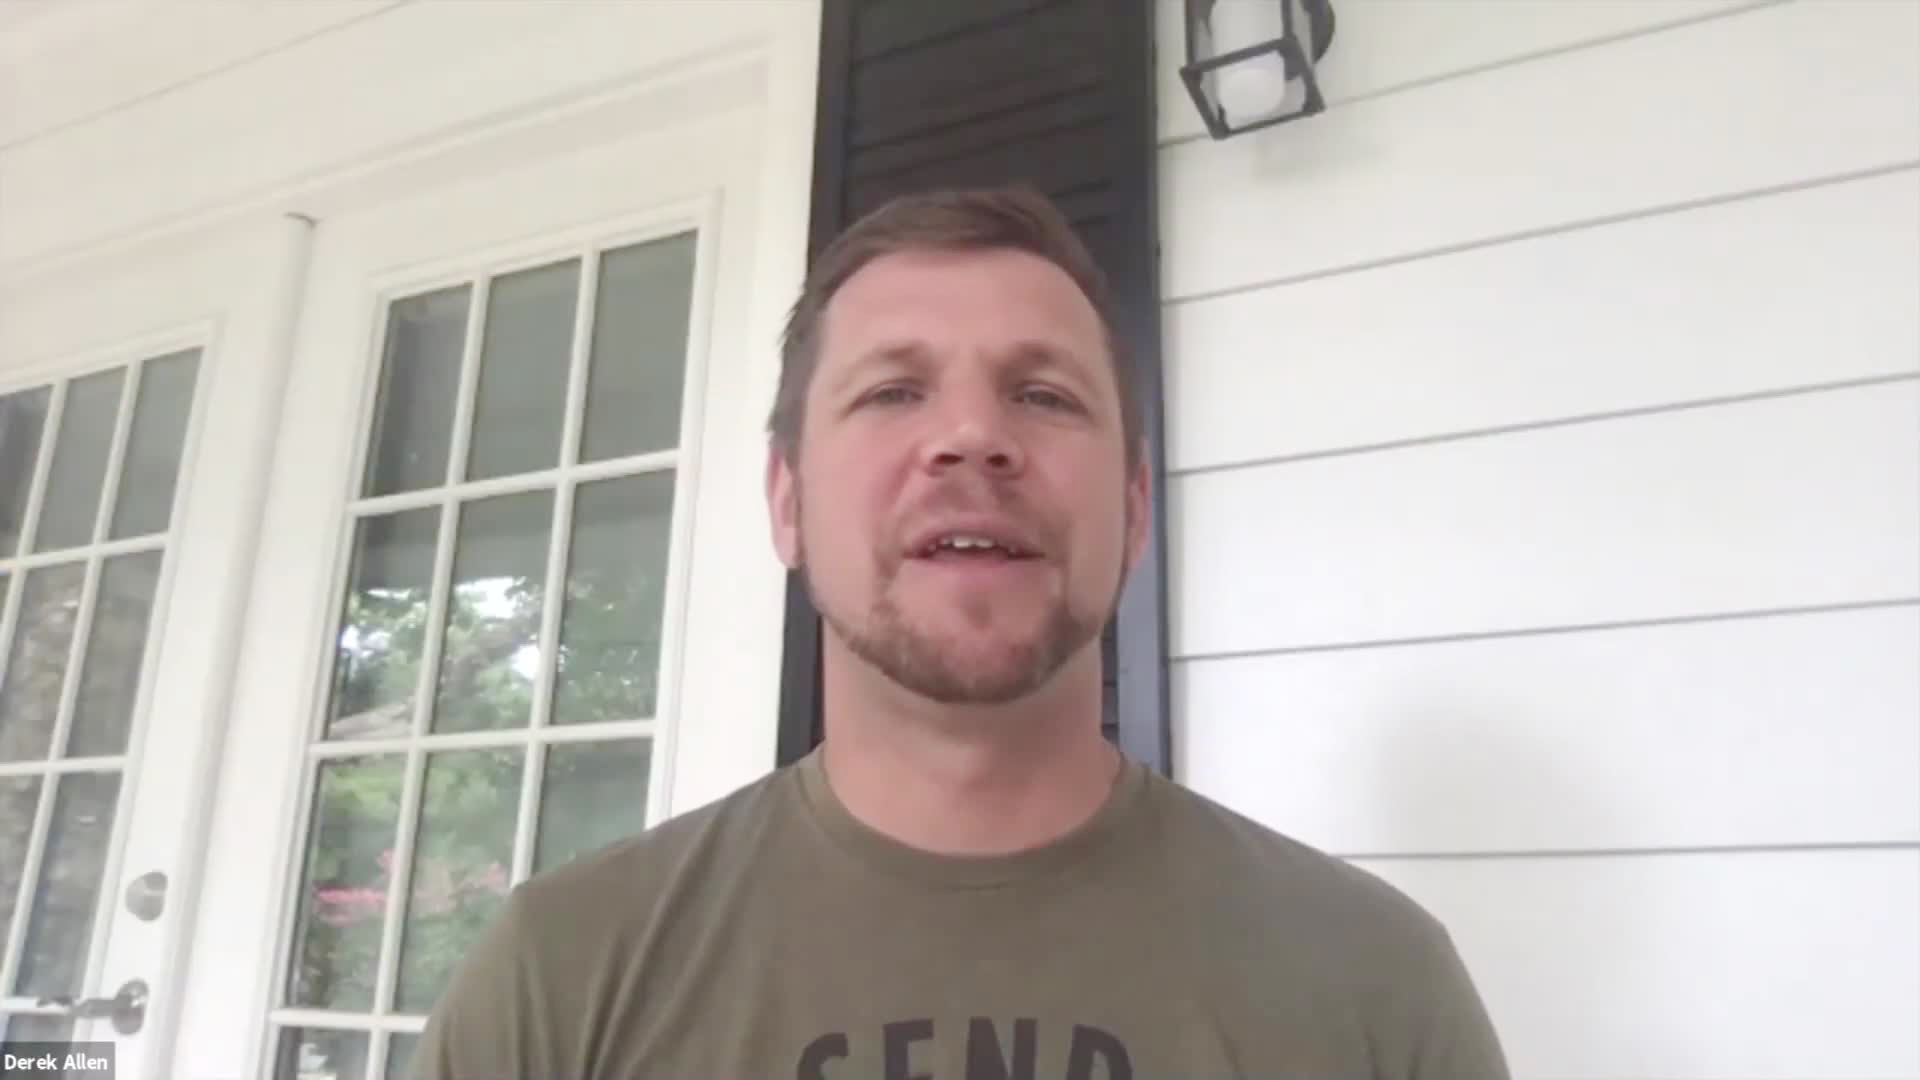 Alabama pastor closes church and restarts online service due to coronavirus